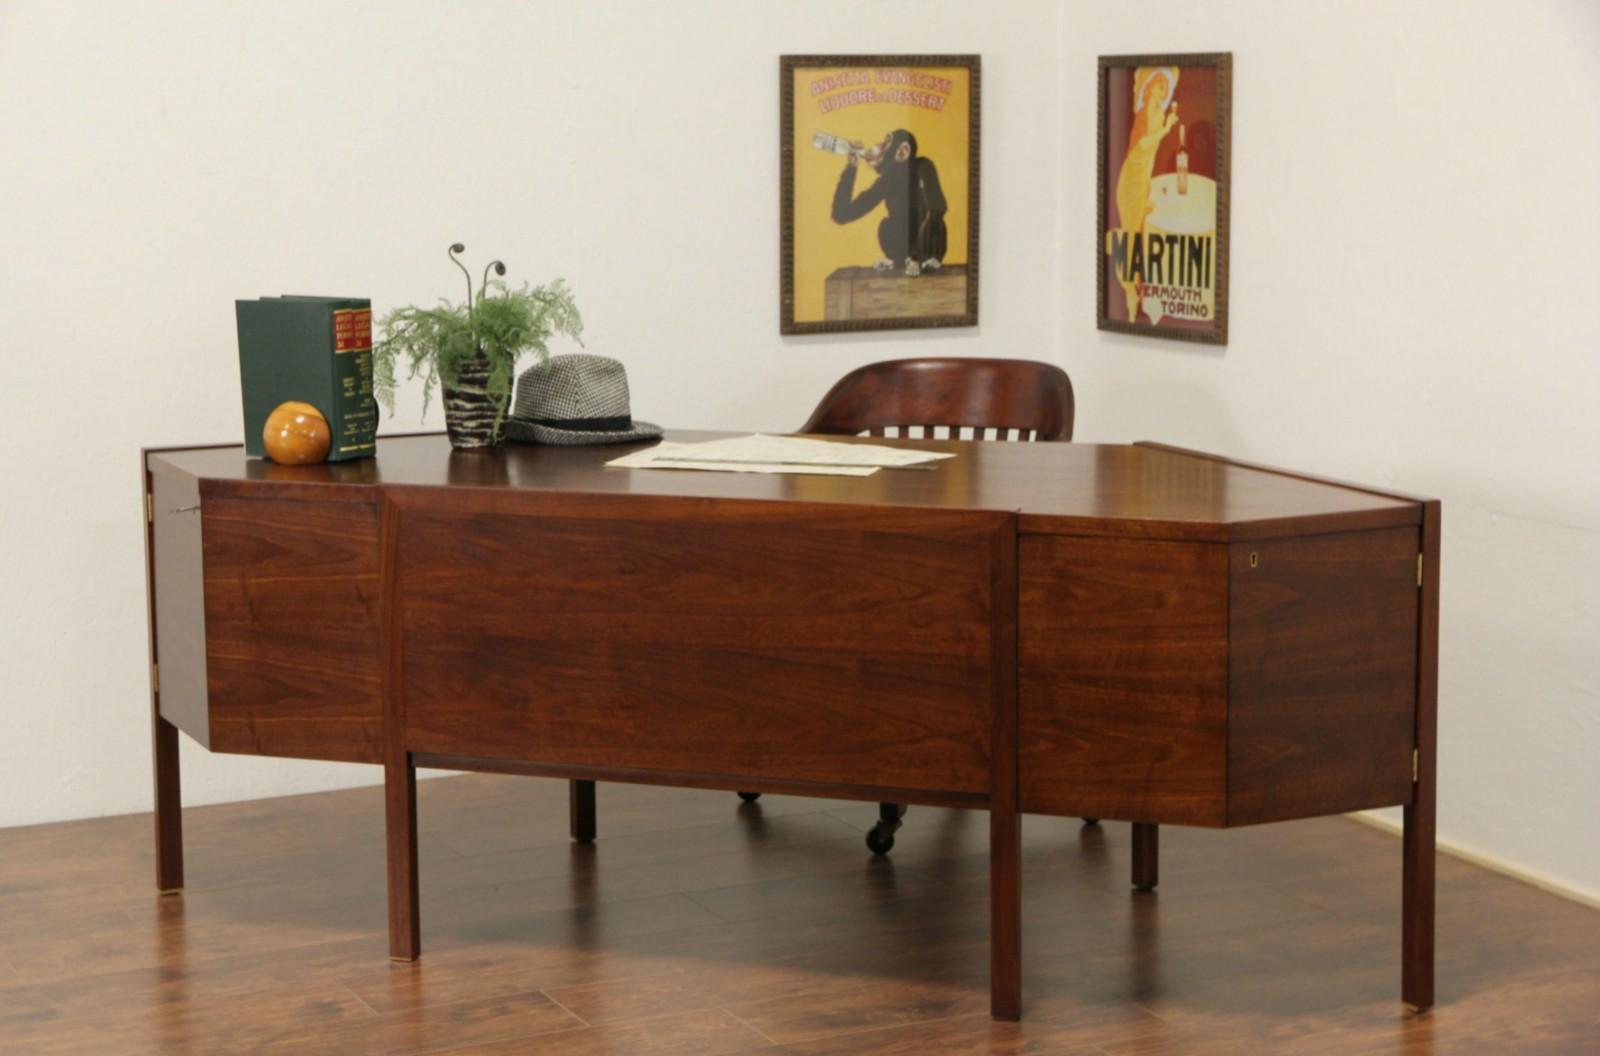 Sold 1960 Vintage Midcentury Modern Dunbar Executive Walnut Desk